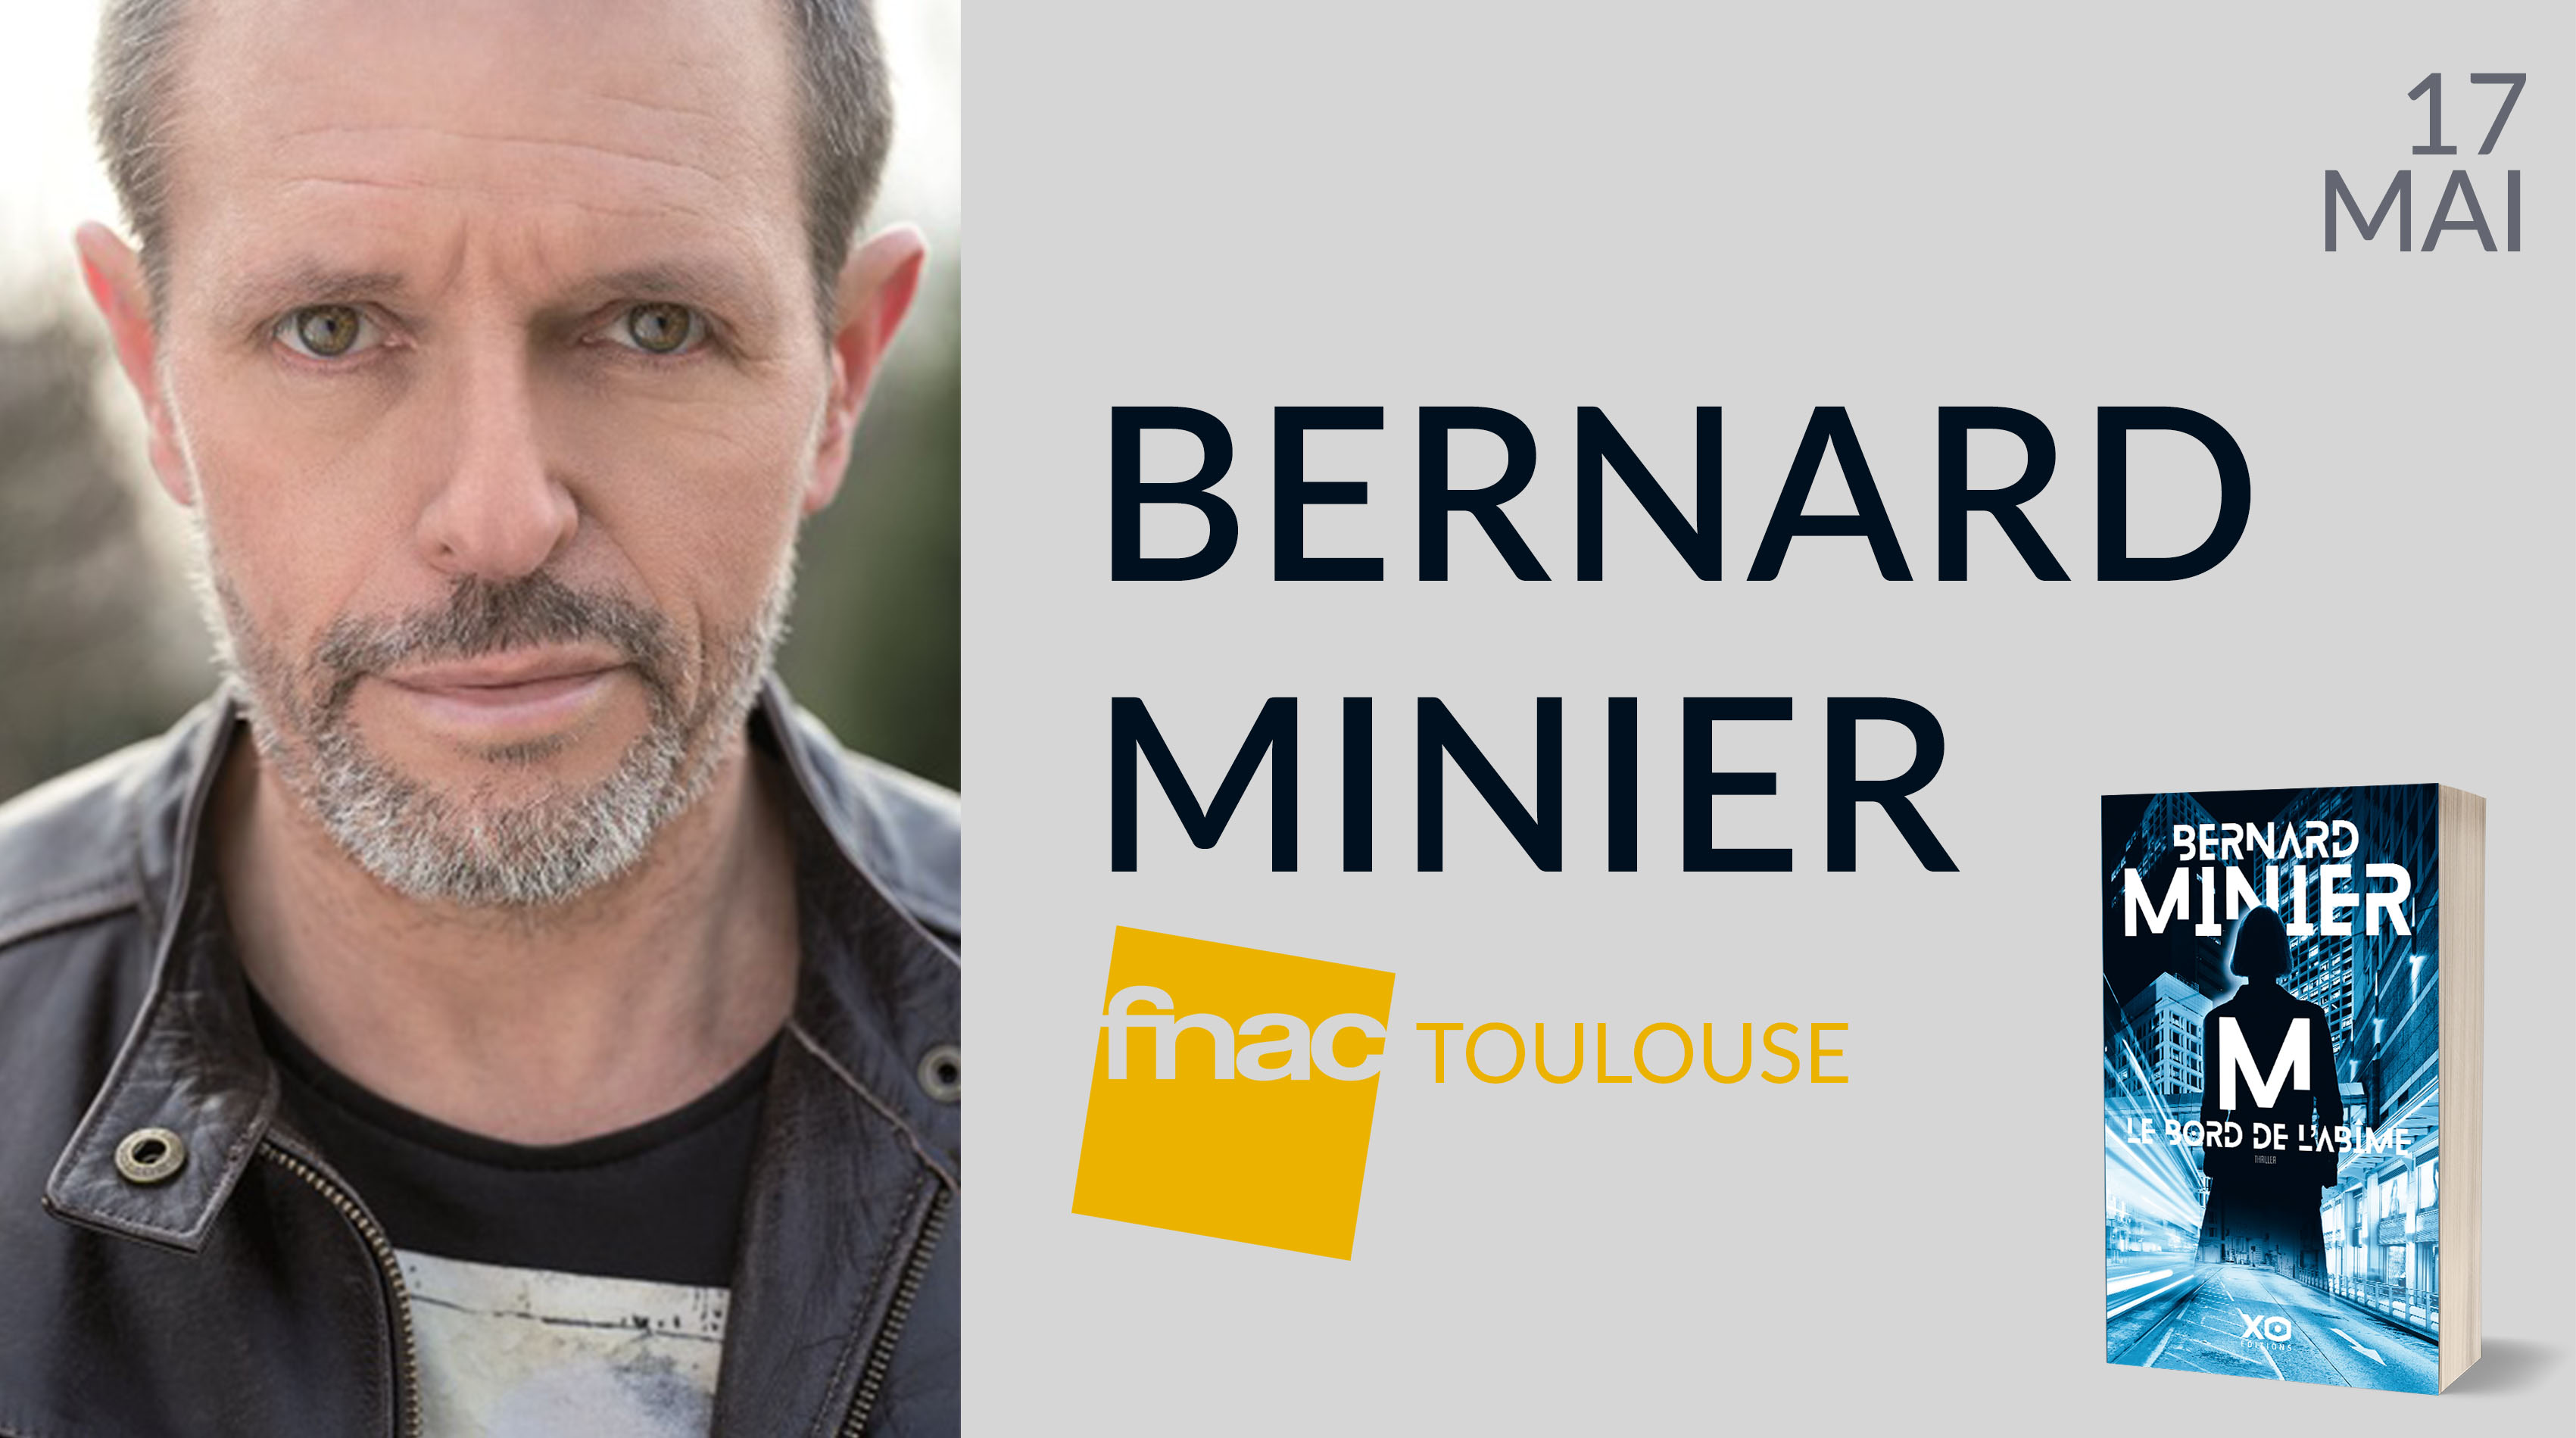 BERNARD MINIER À TOULOUSE